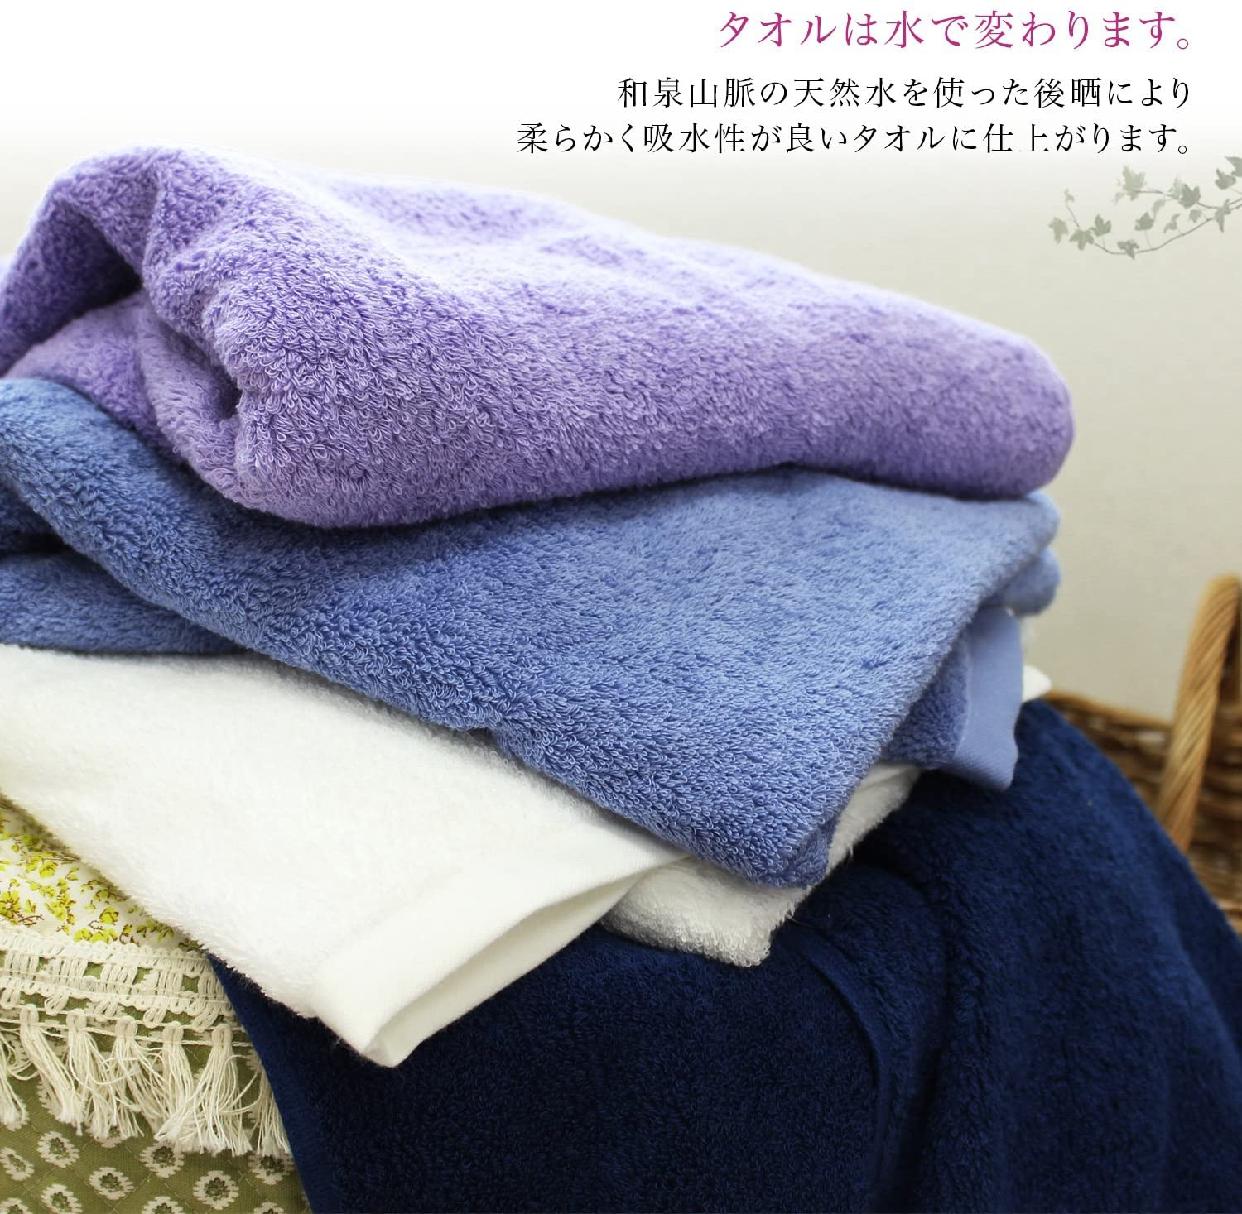 hiorie(ヒオリエ) ホテルスタイルタオルの商品画像4